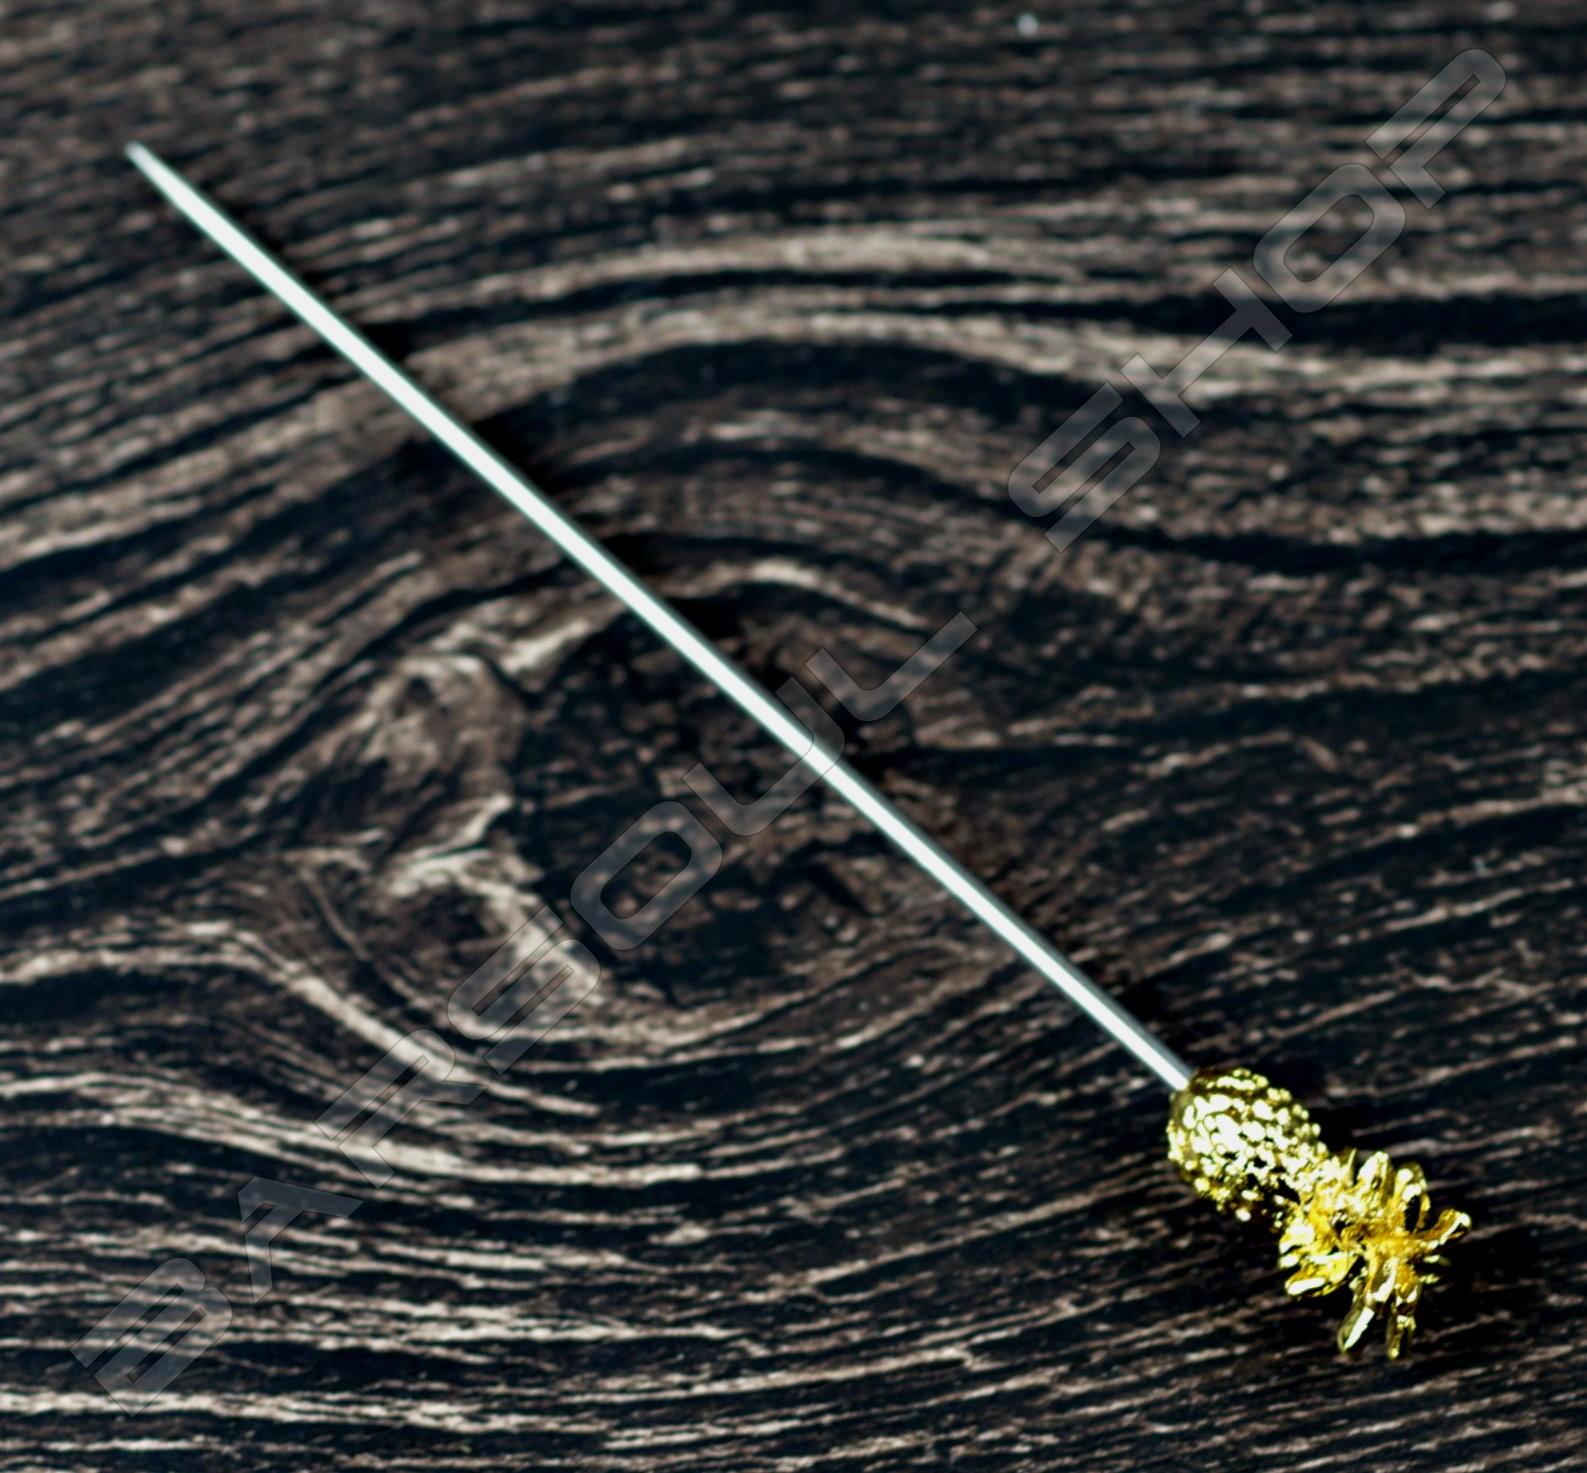 鳳梨金屬劍插 Pinaapple steel cocktail stick